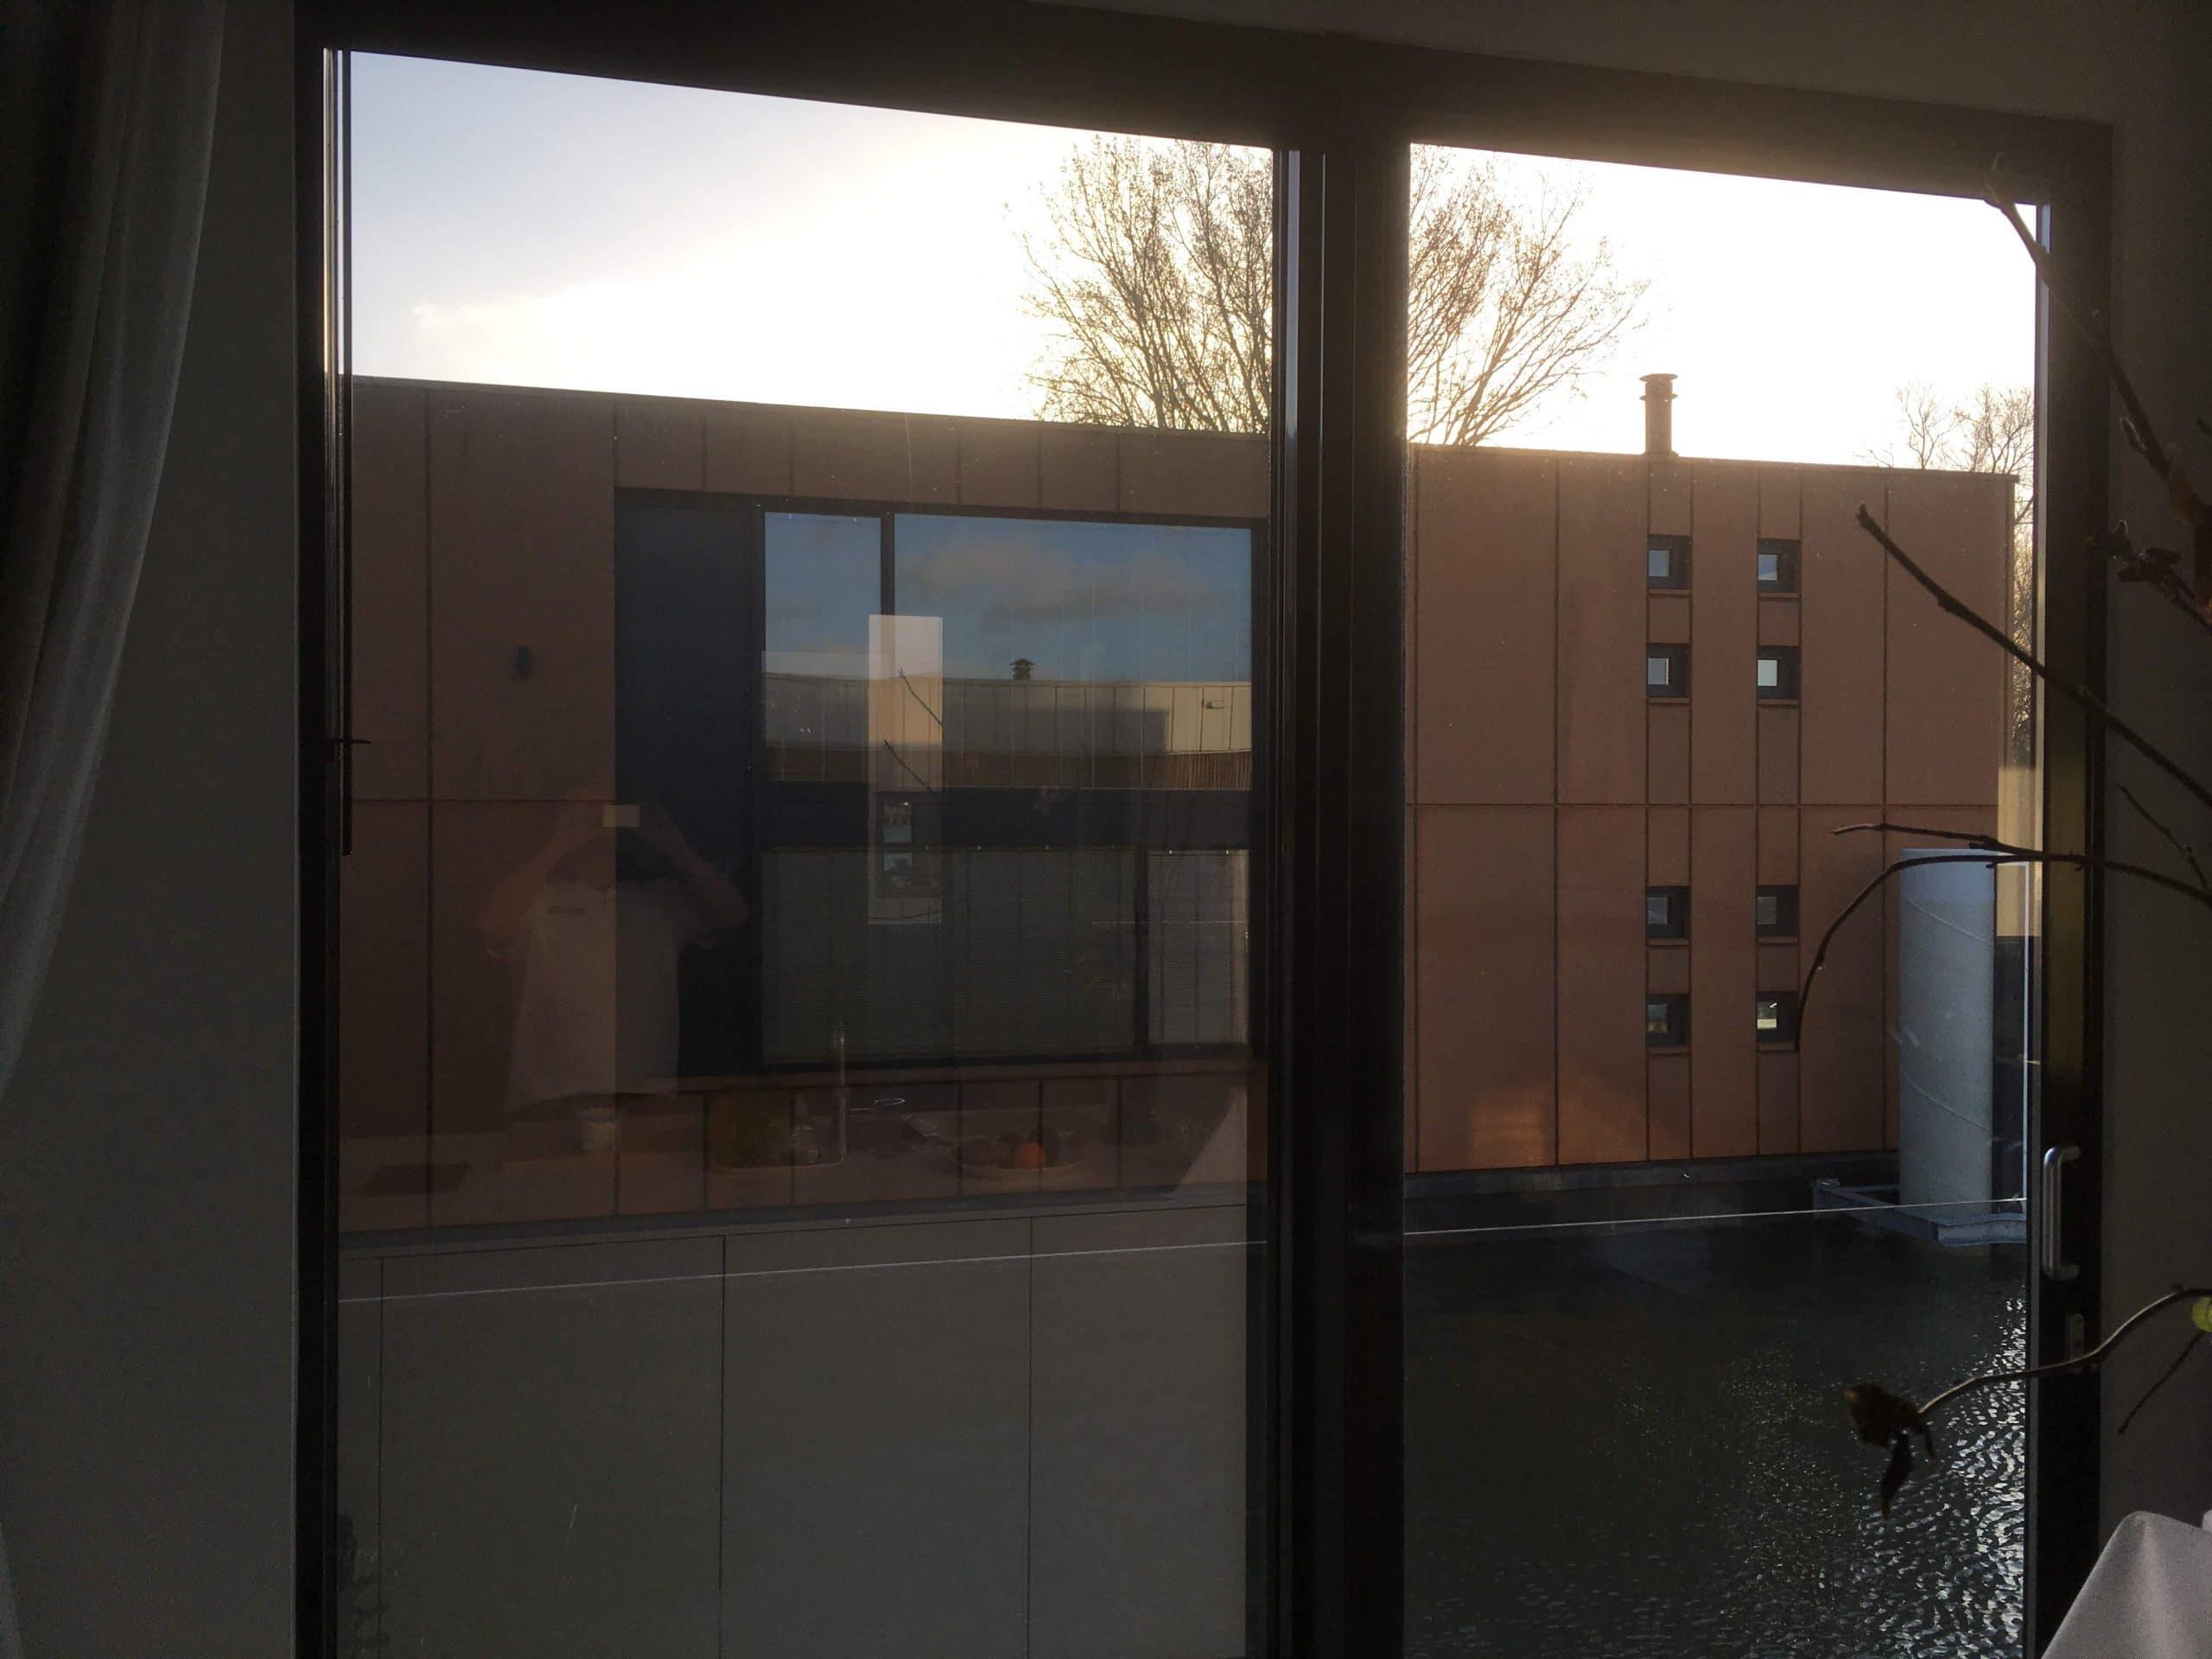 Clearview 50 binnen gemonteerd in particuliere woning lichtreductie 50% zonnewarmte reductie tot 50%